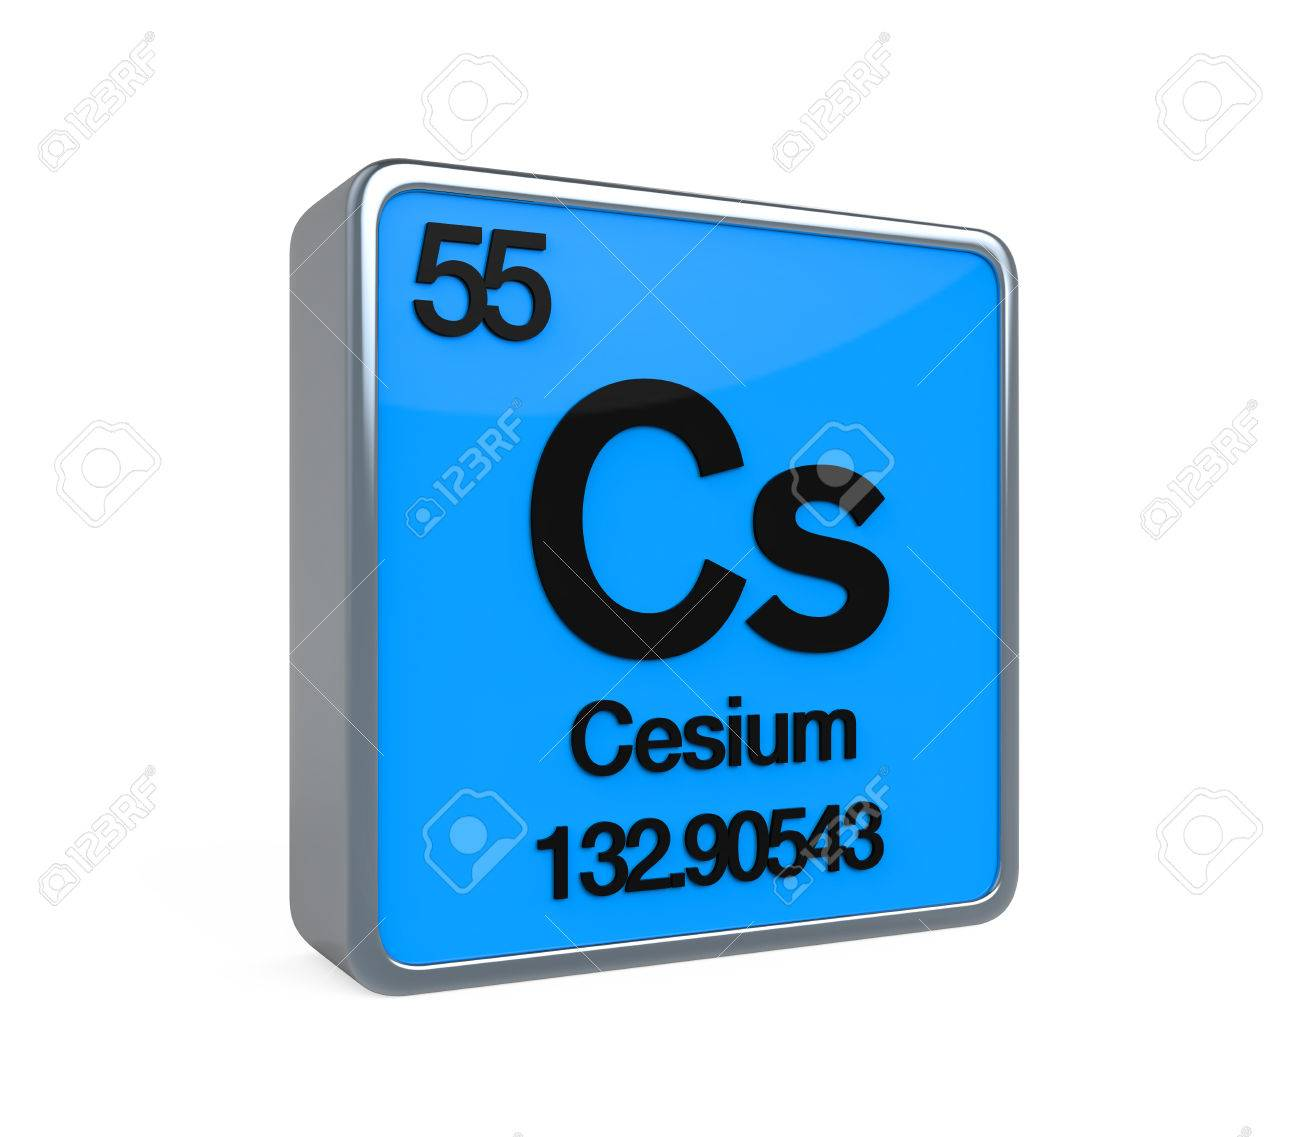 Cesium element periodic table stock photo picture and royalty cesium element periodic table stock photo 33006965 gamestrikefo Choice Image